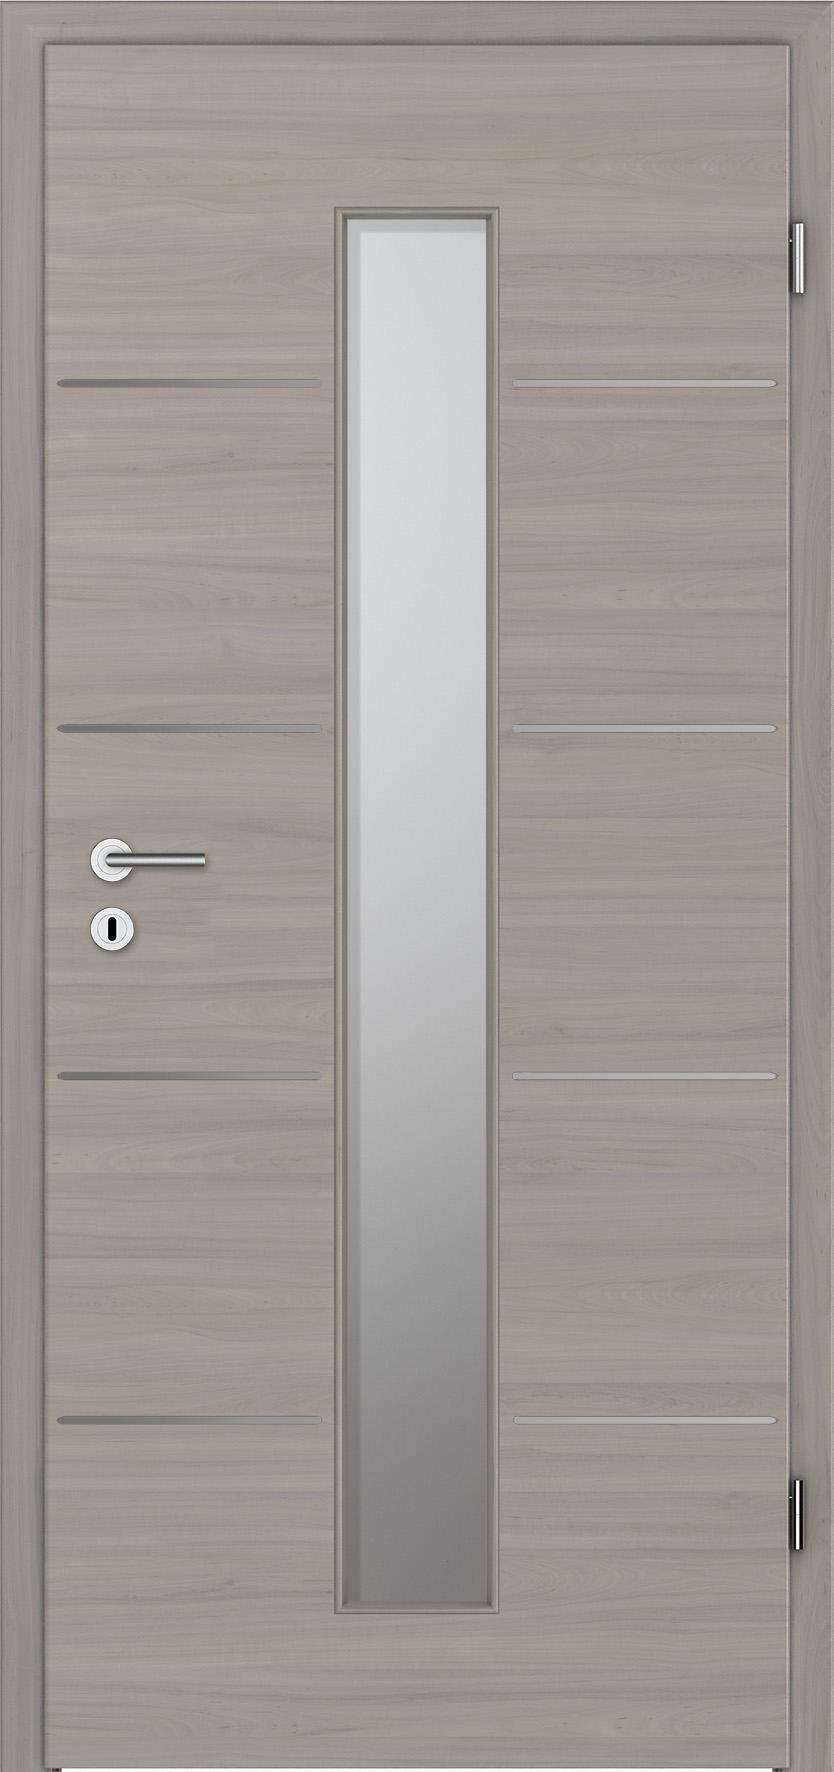 RY-551-LA2 CPL Pera Grey DQ